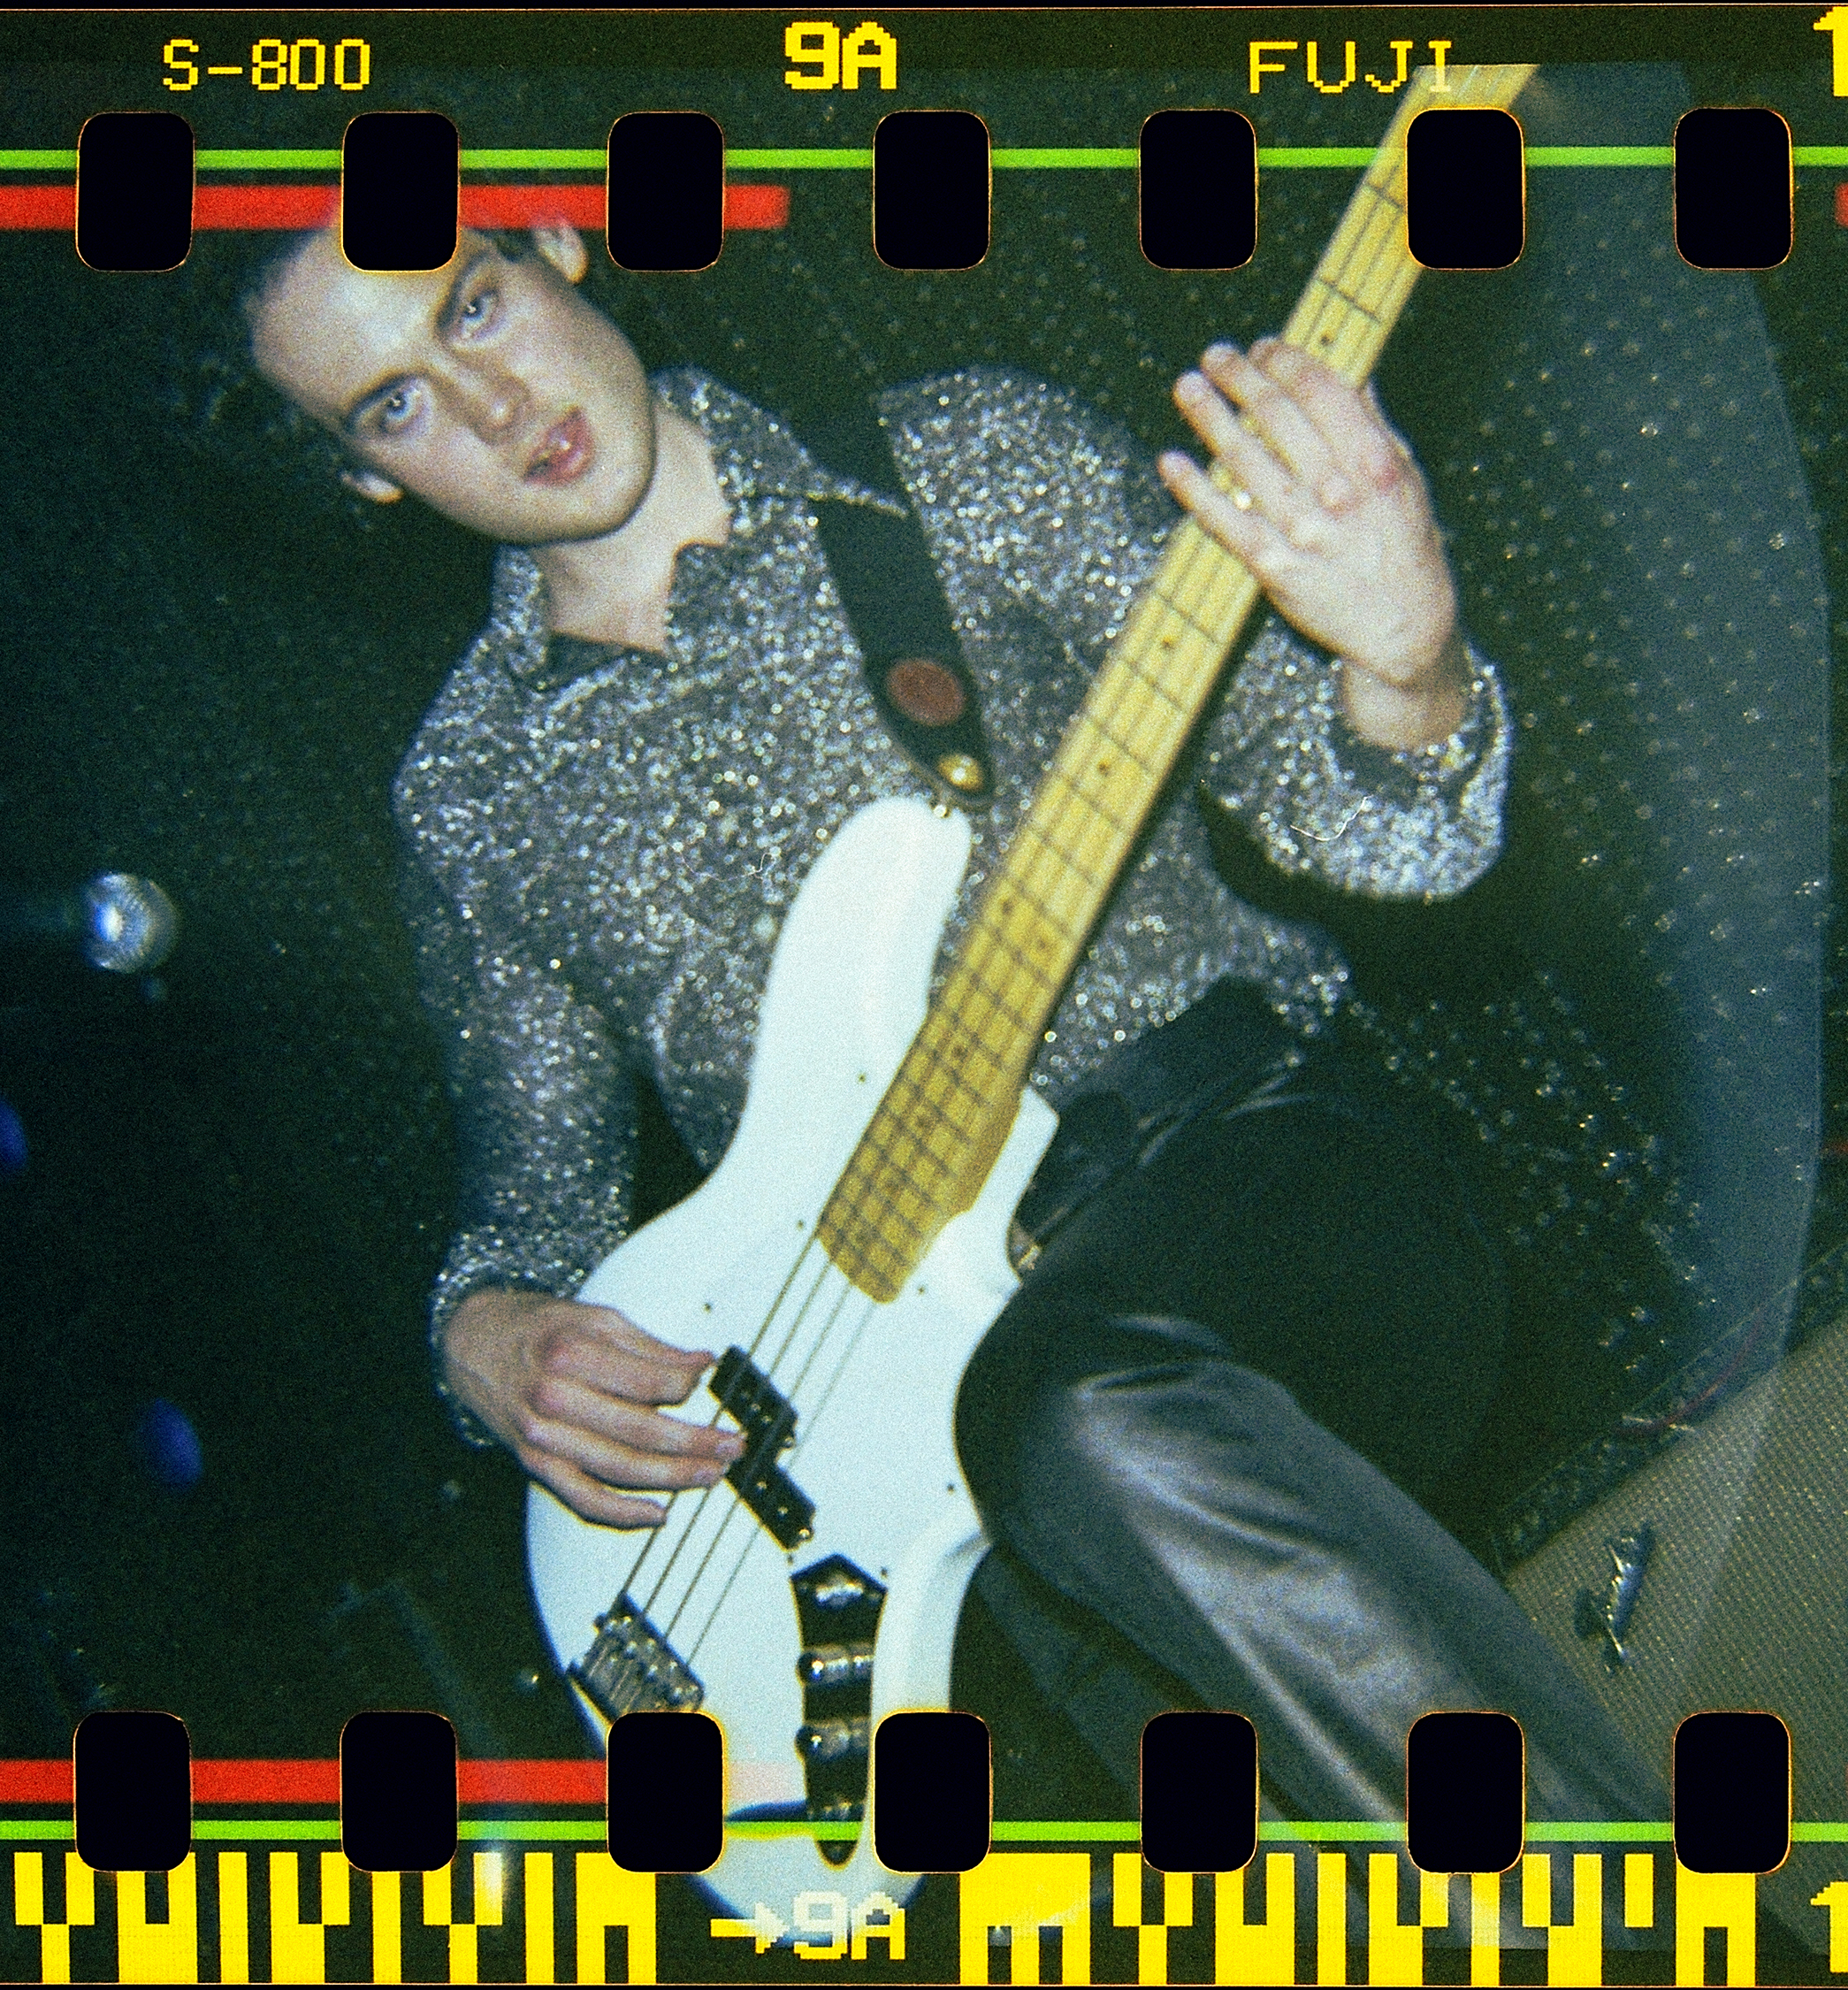 Bassist Ryan Wheeler of Blame Candy